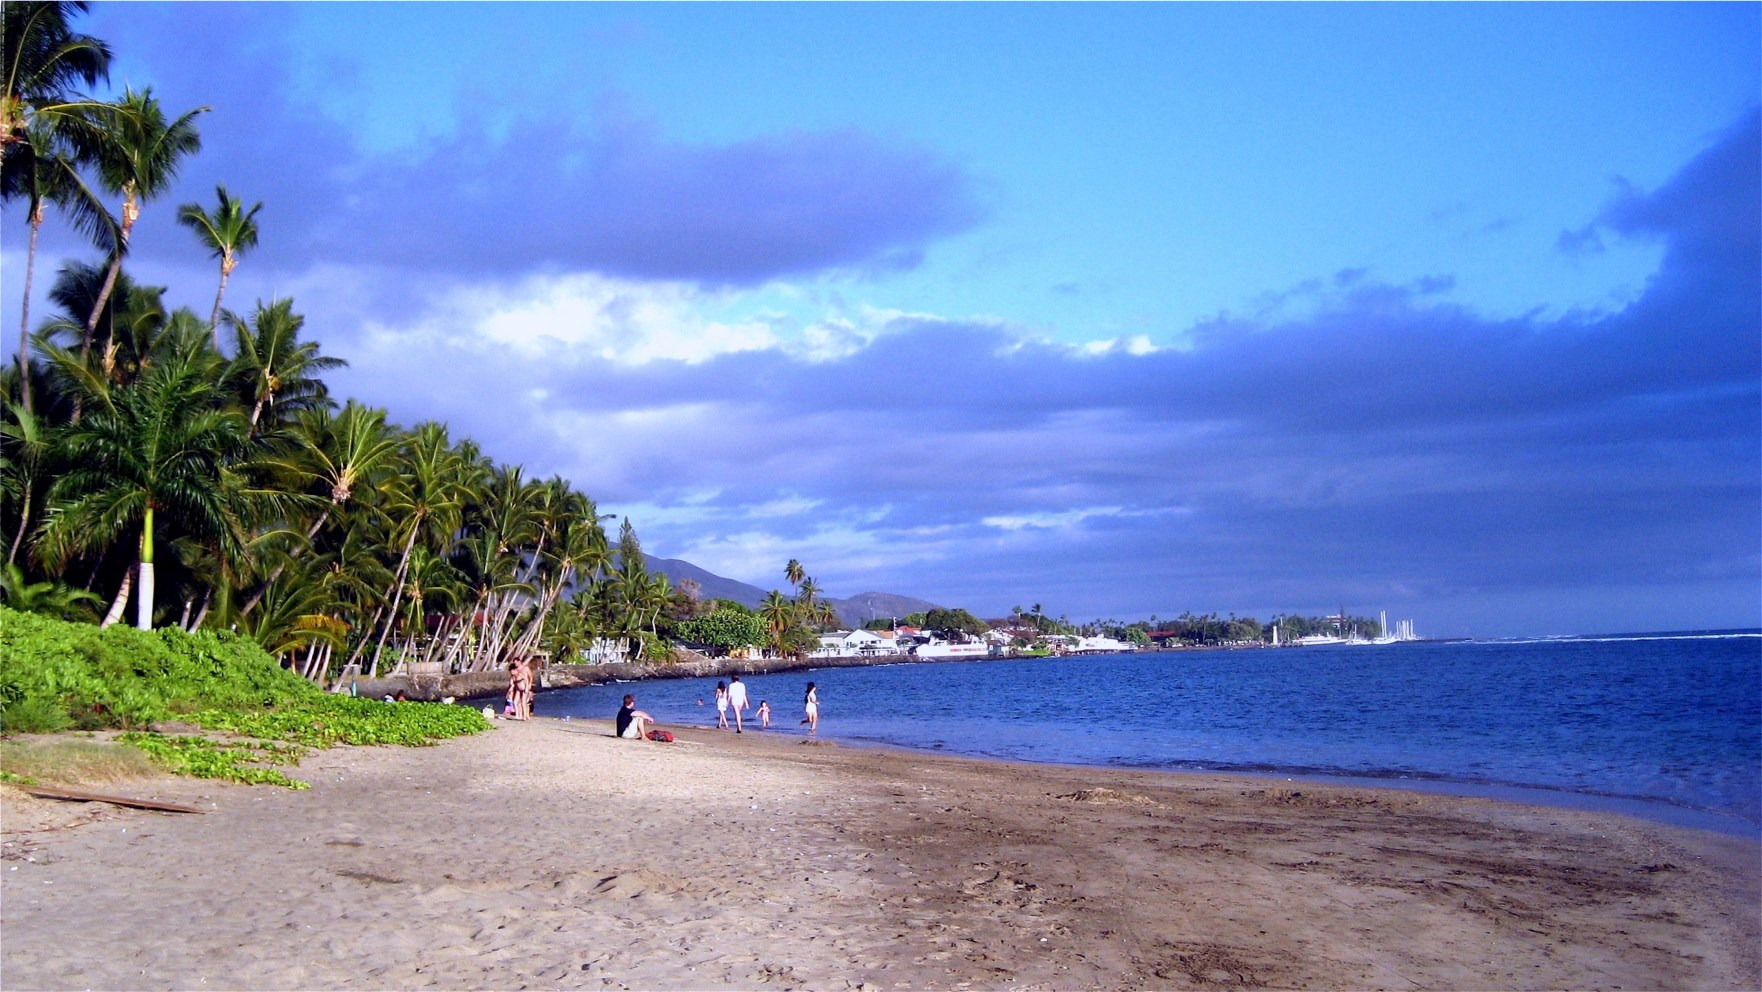 Car Rental Companies In Lahaina Maui